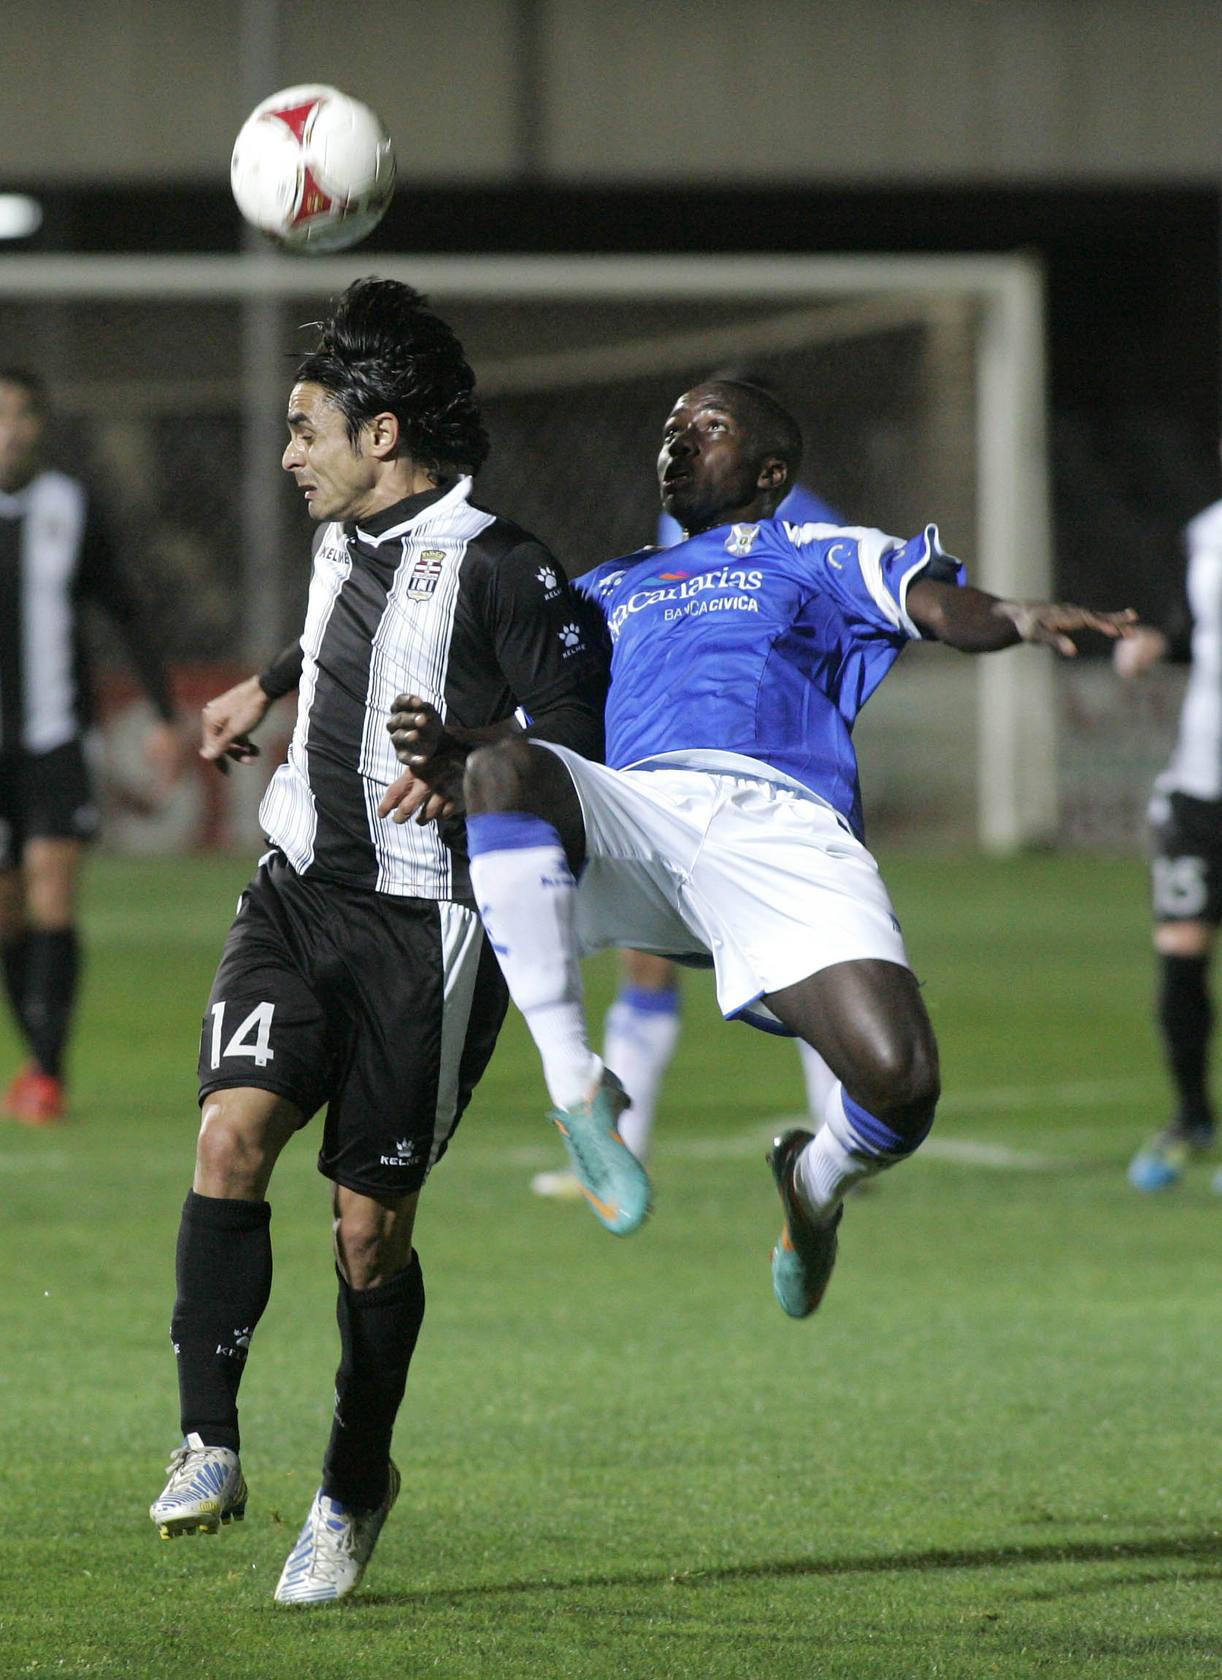 F.C. Cartagena - Tenerife B (3 - 3)